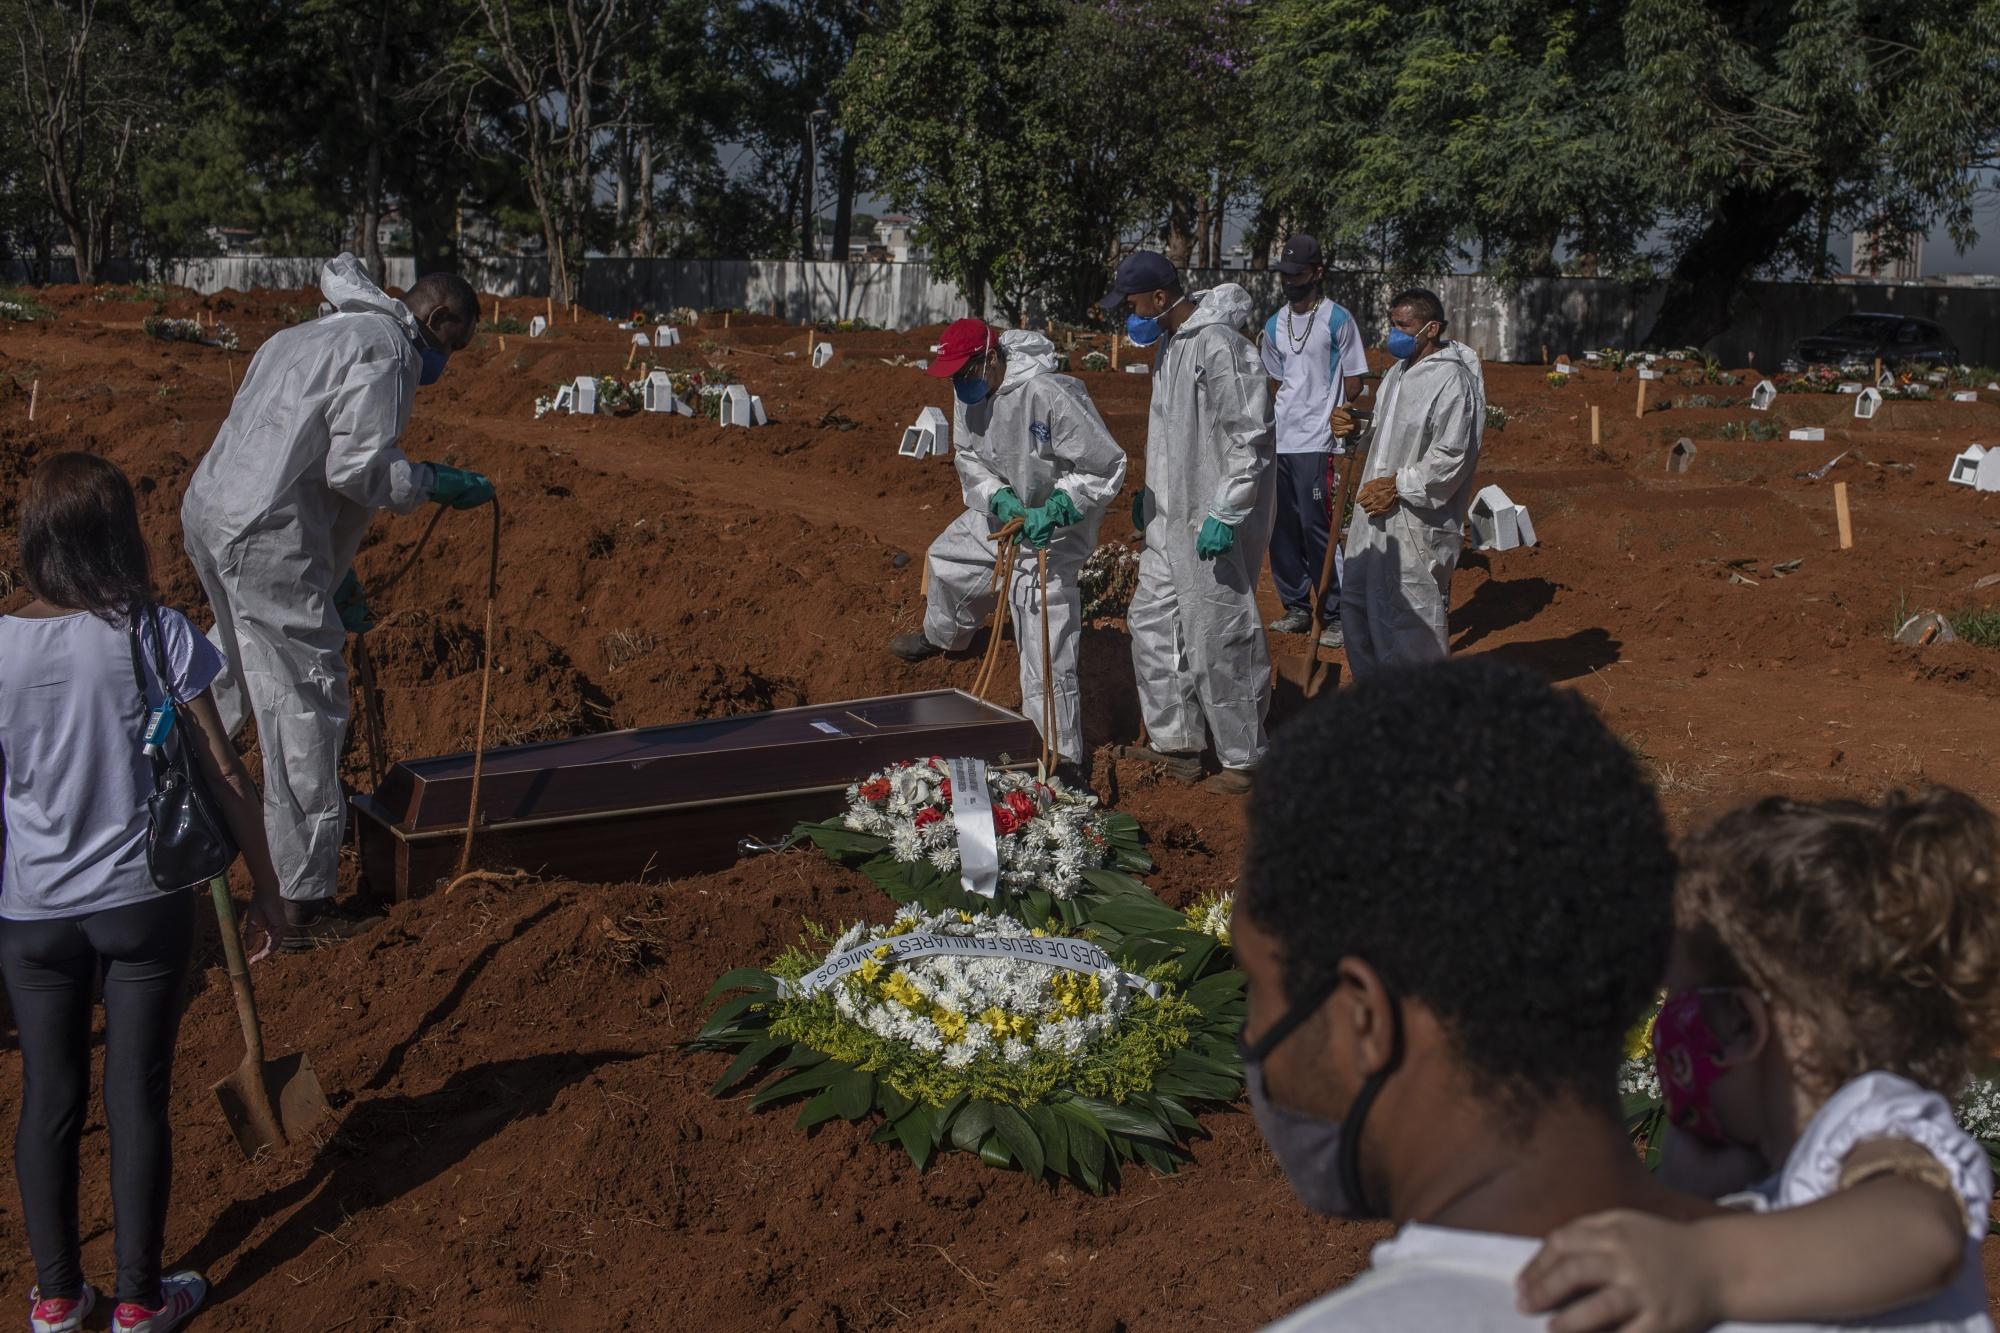 Brazil approaches grim milestone of 300,000 coronavirus deaths